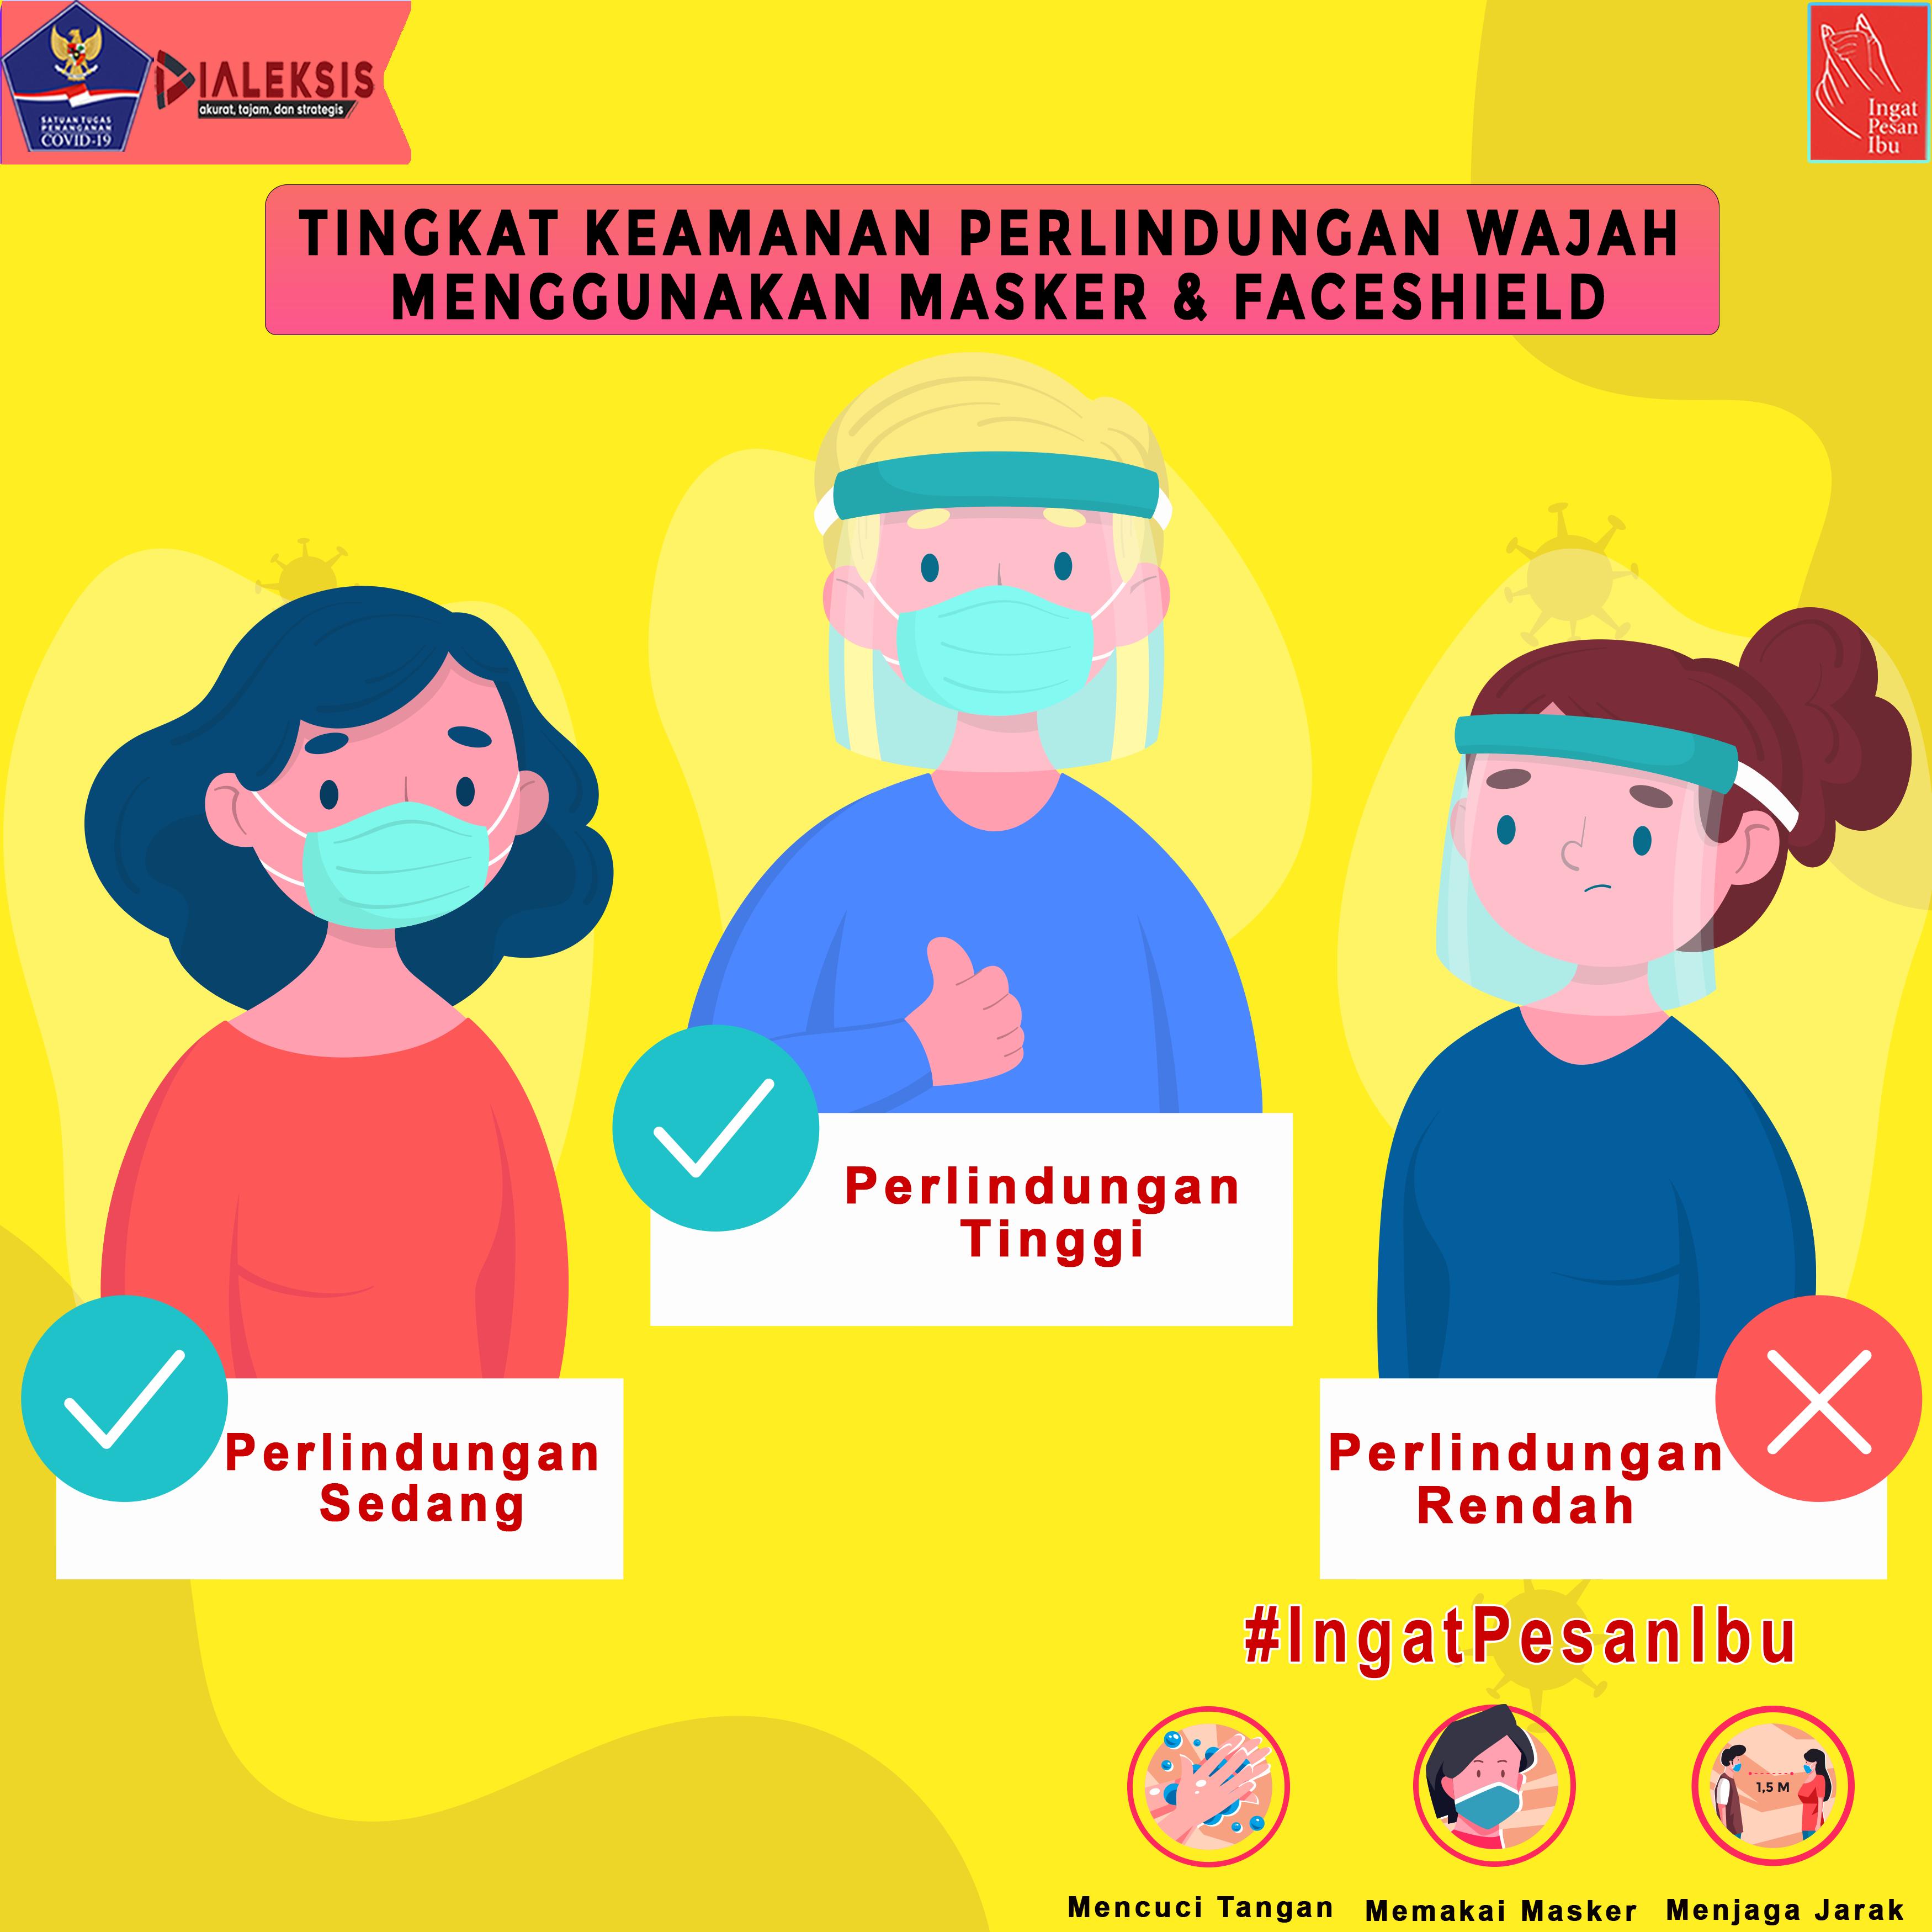 Tingkat Keamanan Perlindungan Wajah Menggunakan Masker & Faceshield